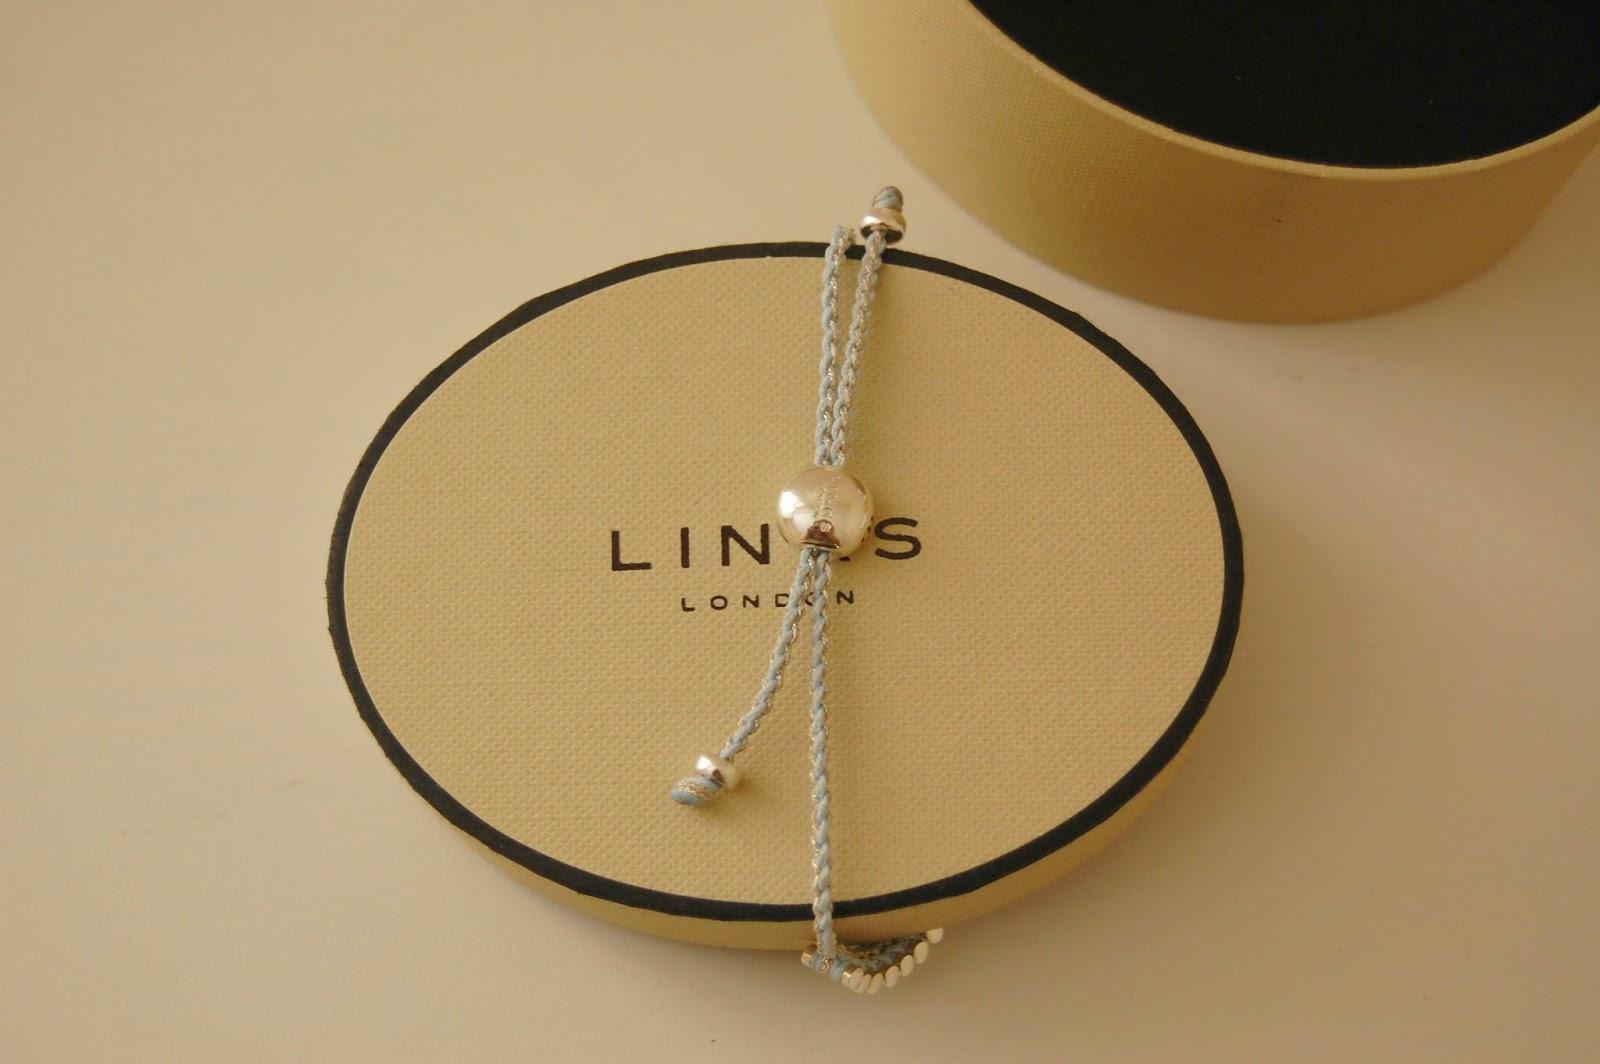 Links_of_London_Pale_Blue_Skinny_Friendship_Bracelet